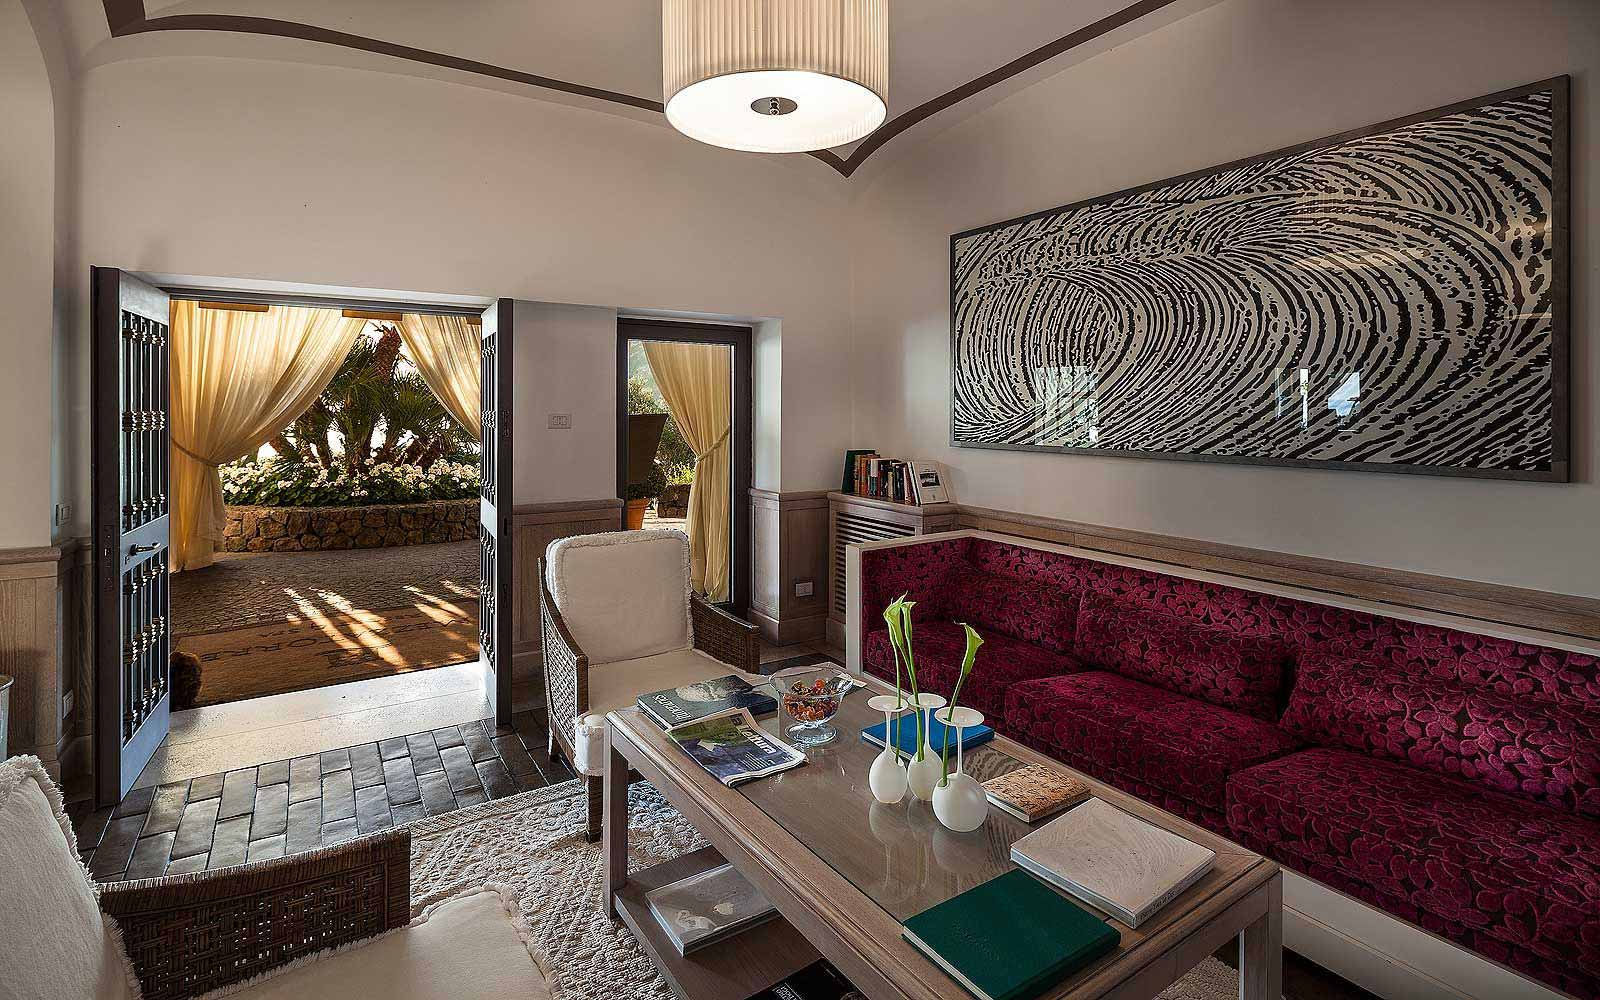 Reception at Mezzatorre Resort & Spa